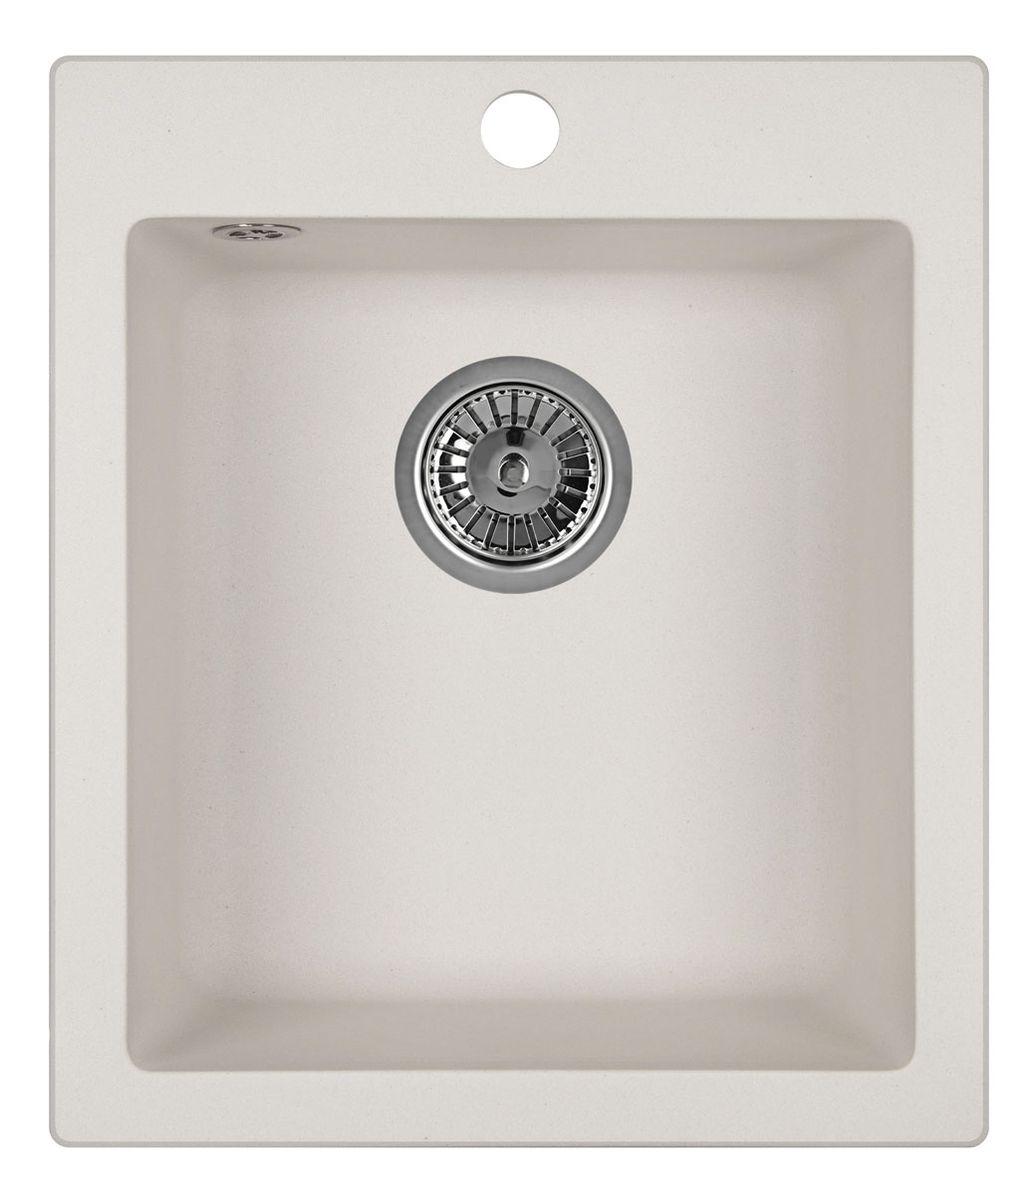 "����� Weissgauff ""Quadro 420 Eco Granit"", ����: �����, 41,5 � 19,5 � 49,0 ��"